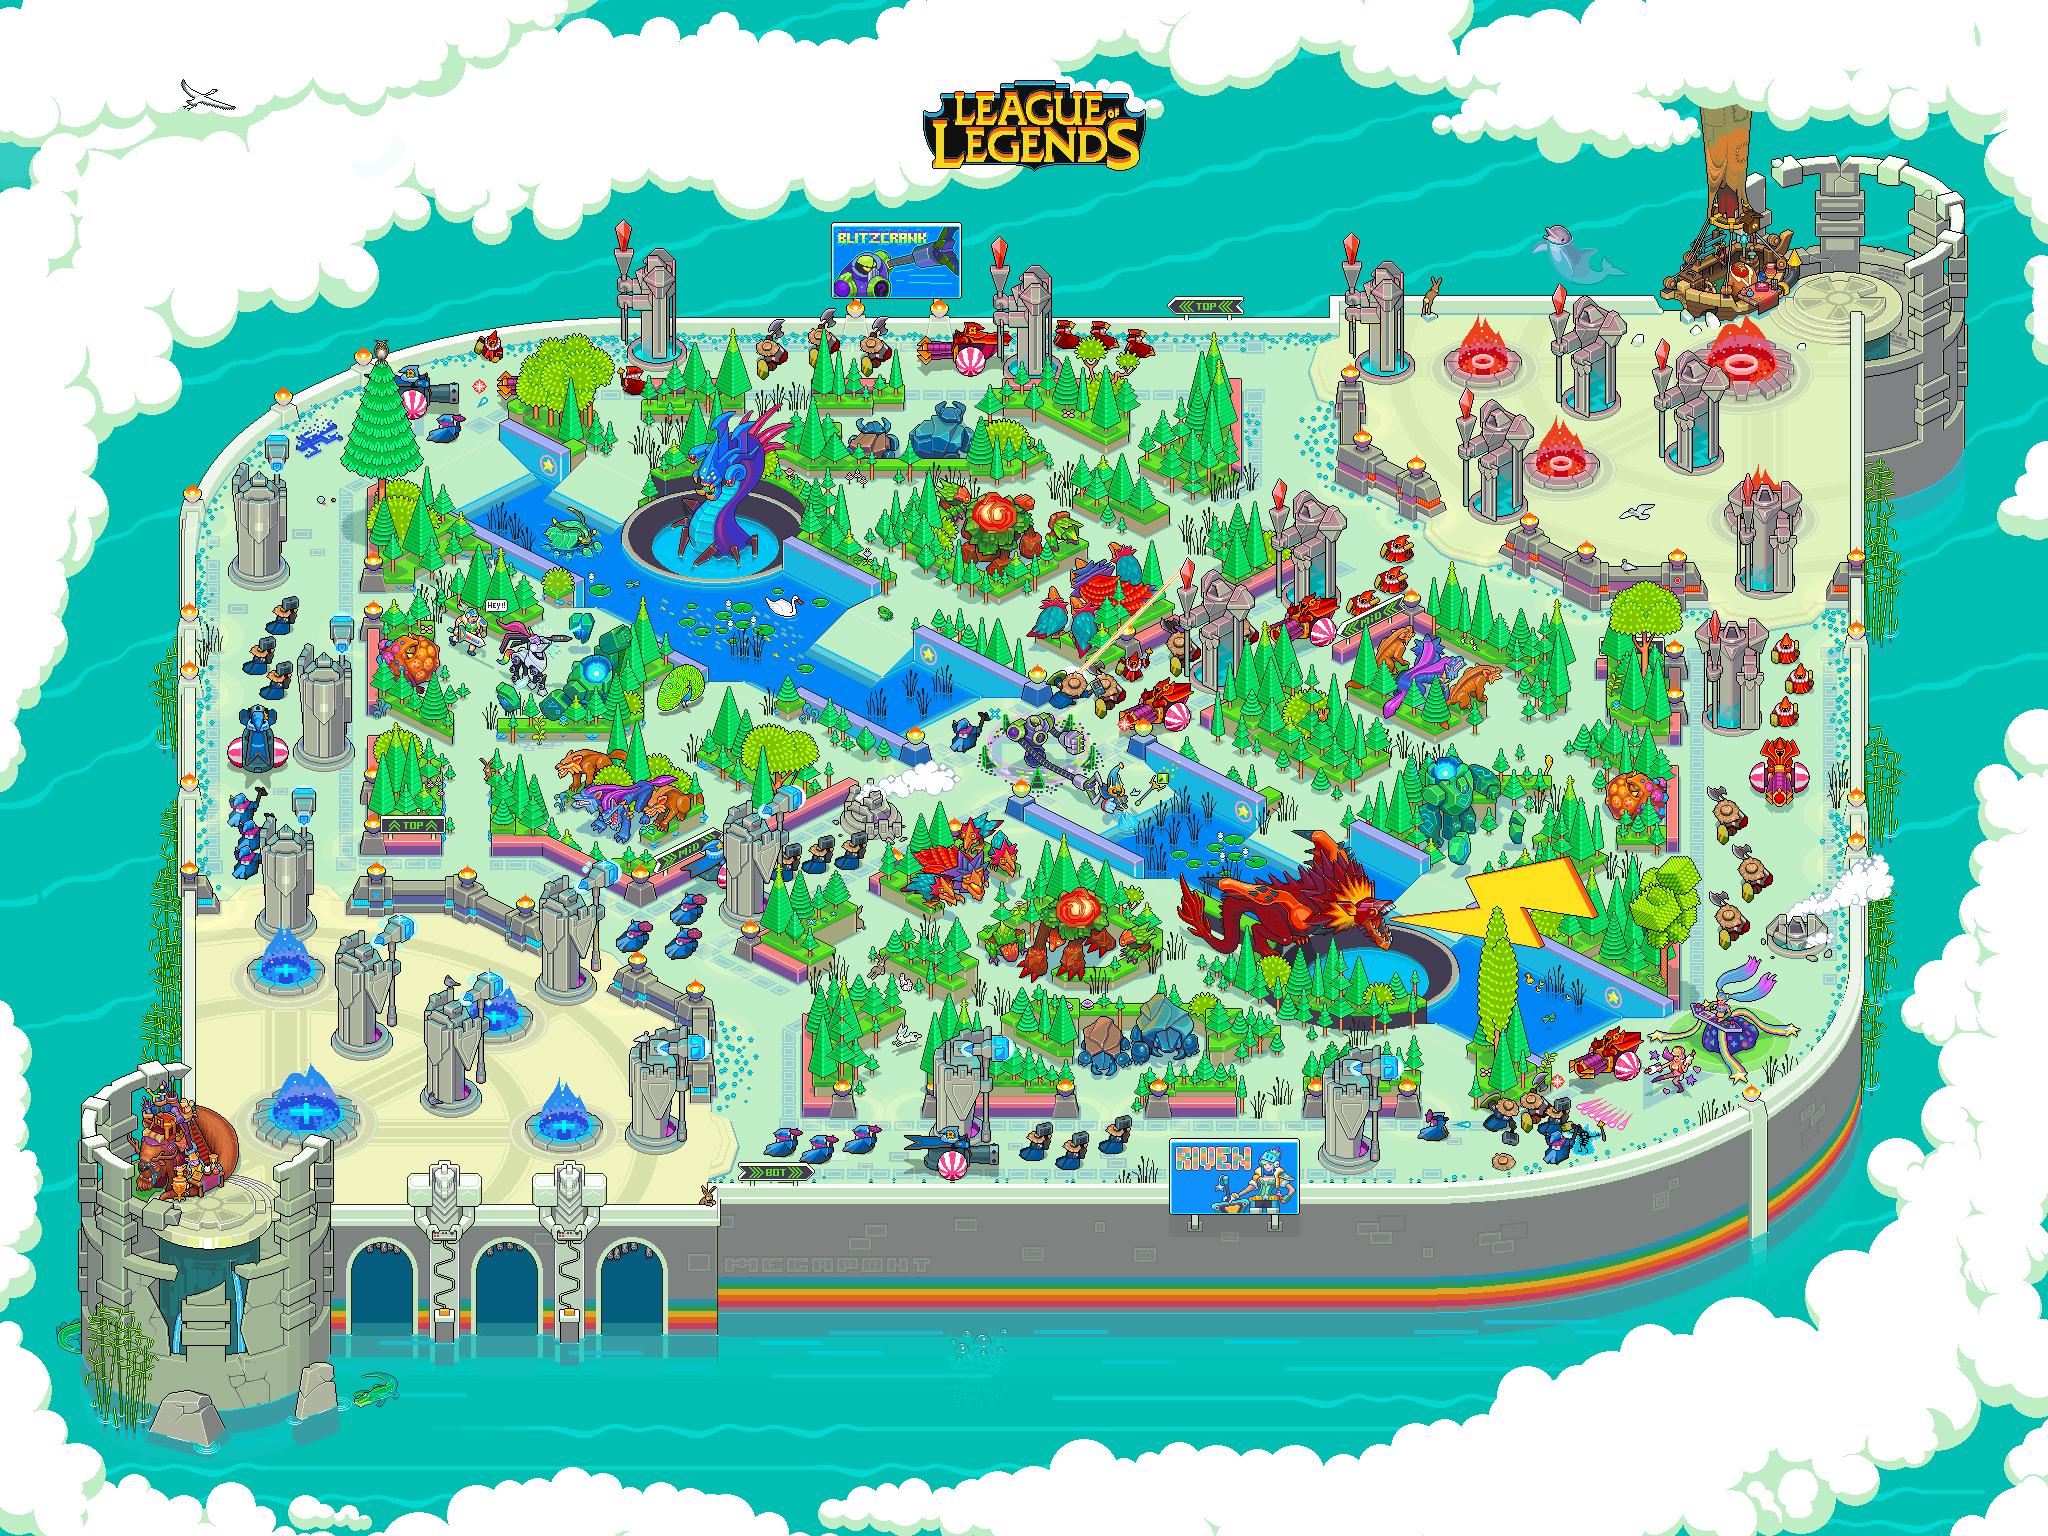 League of Legends pixel art map illustration | Pixel art | Pinterest ...